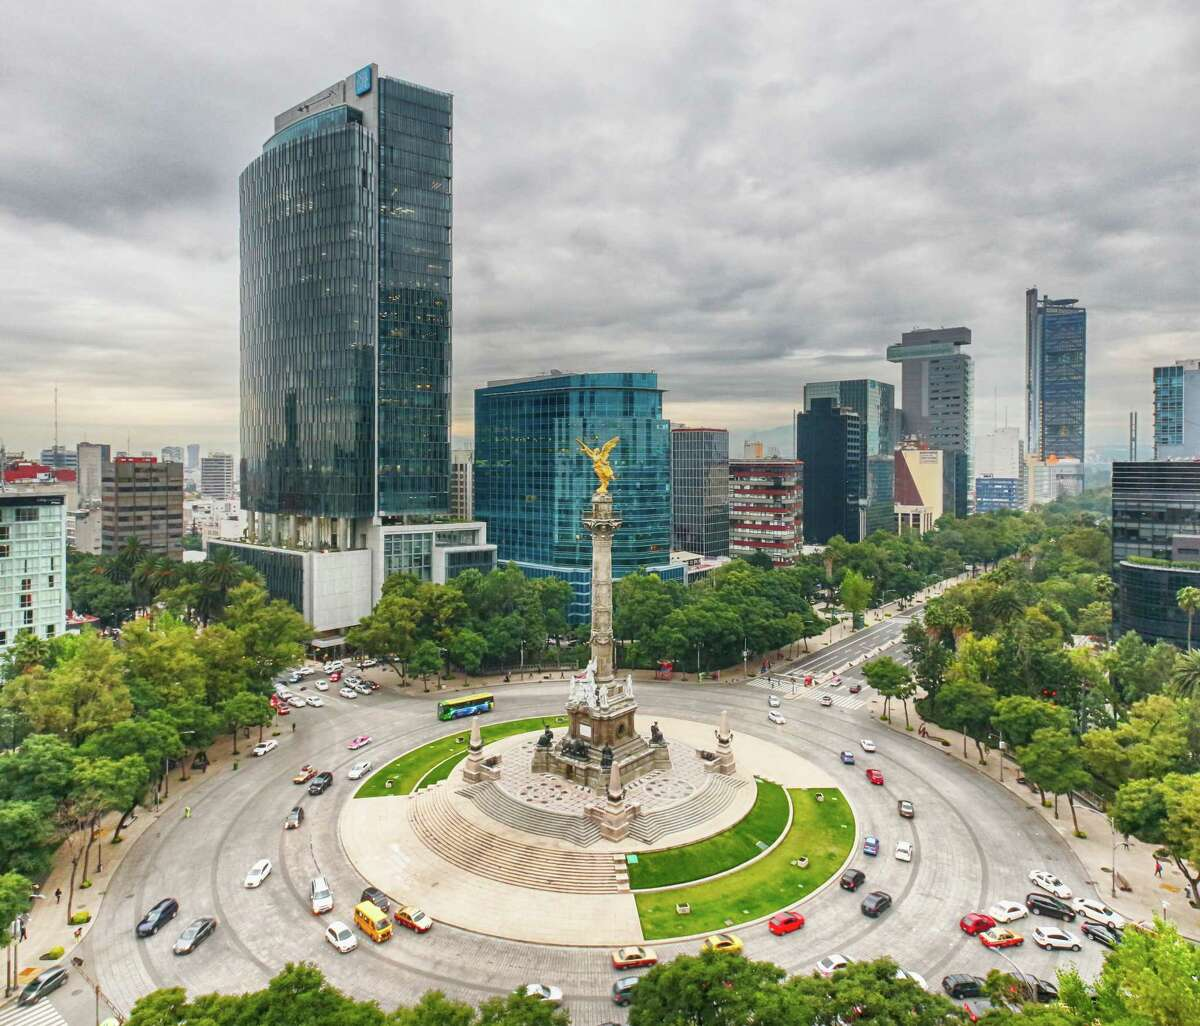 50. Mexico City